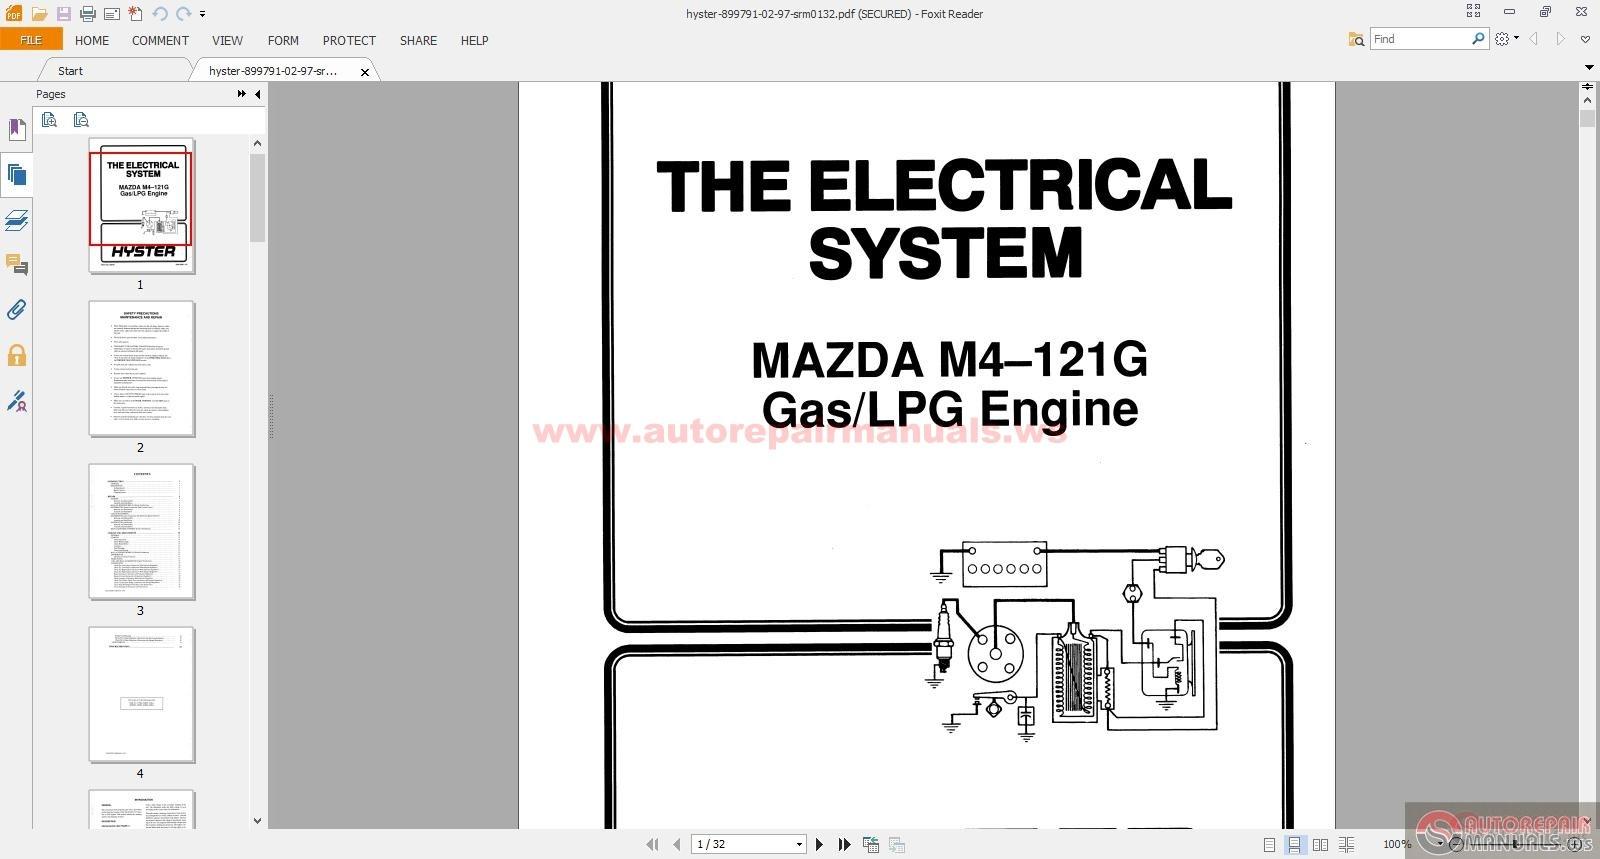 Hyster H100xm Wiring Diagram Great Design Of Electric Forklift Electrical Diagrams Prestolite Alternator